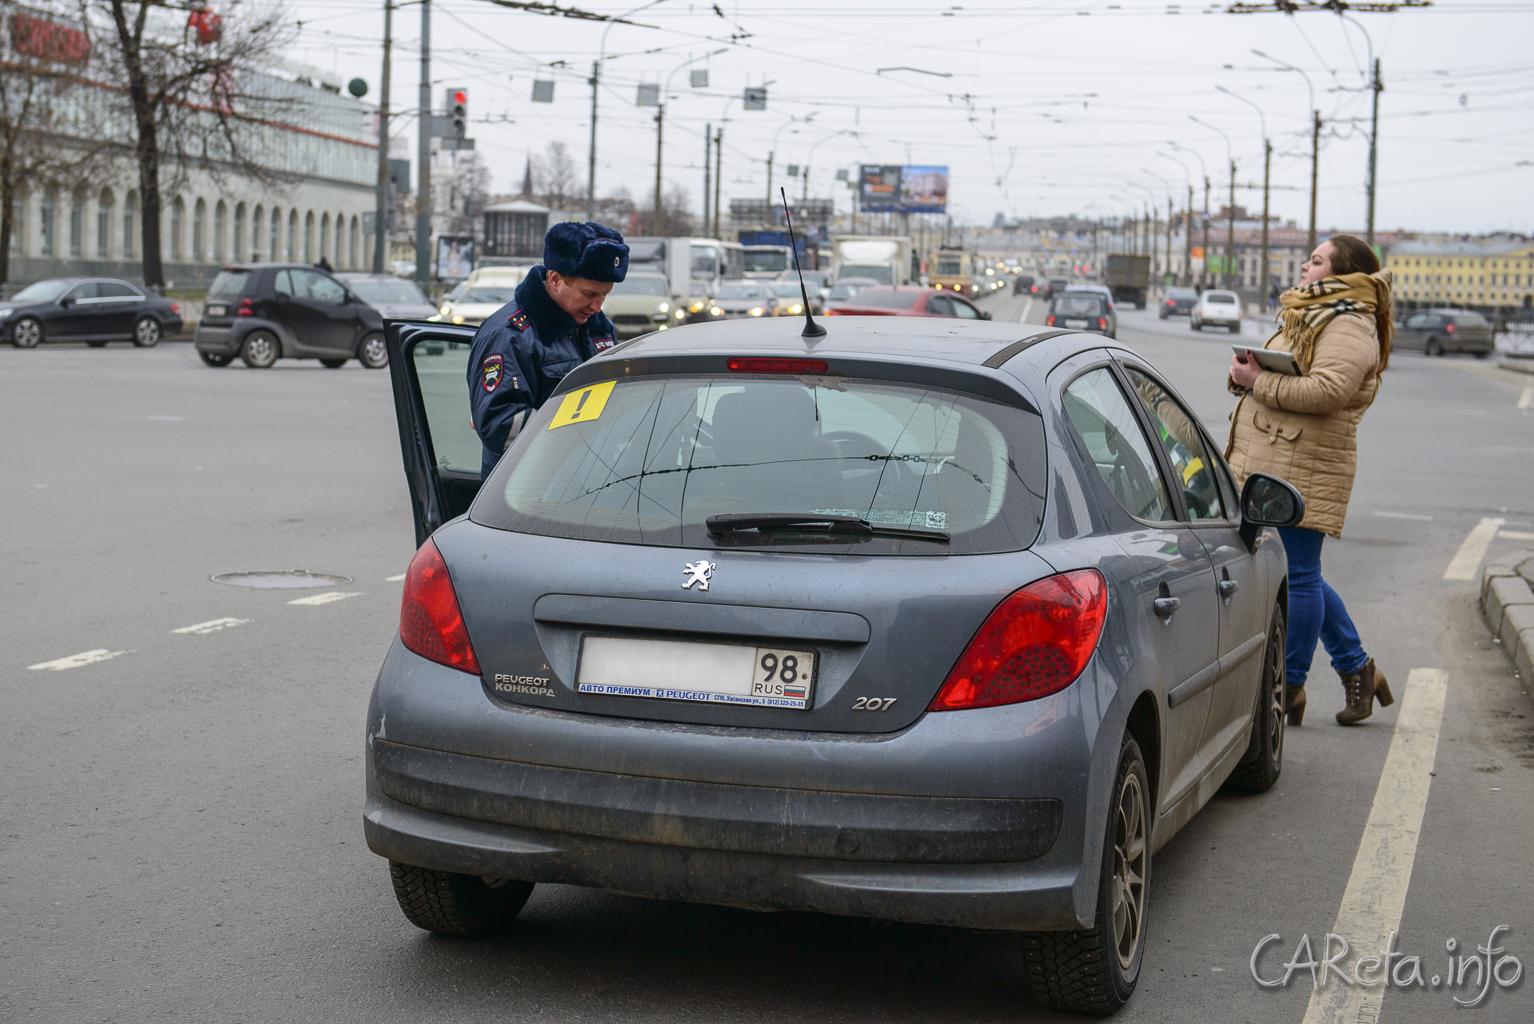 Иностранцам, нарушавшим ПДД, запретят въезд в Россию